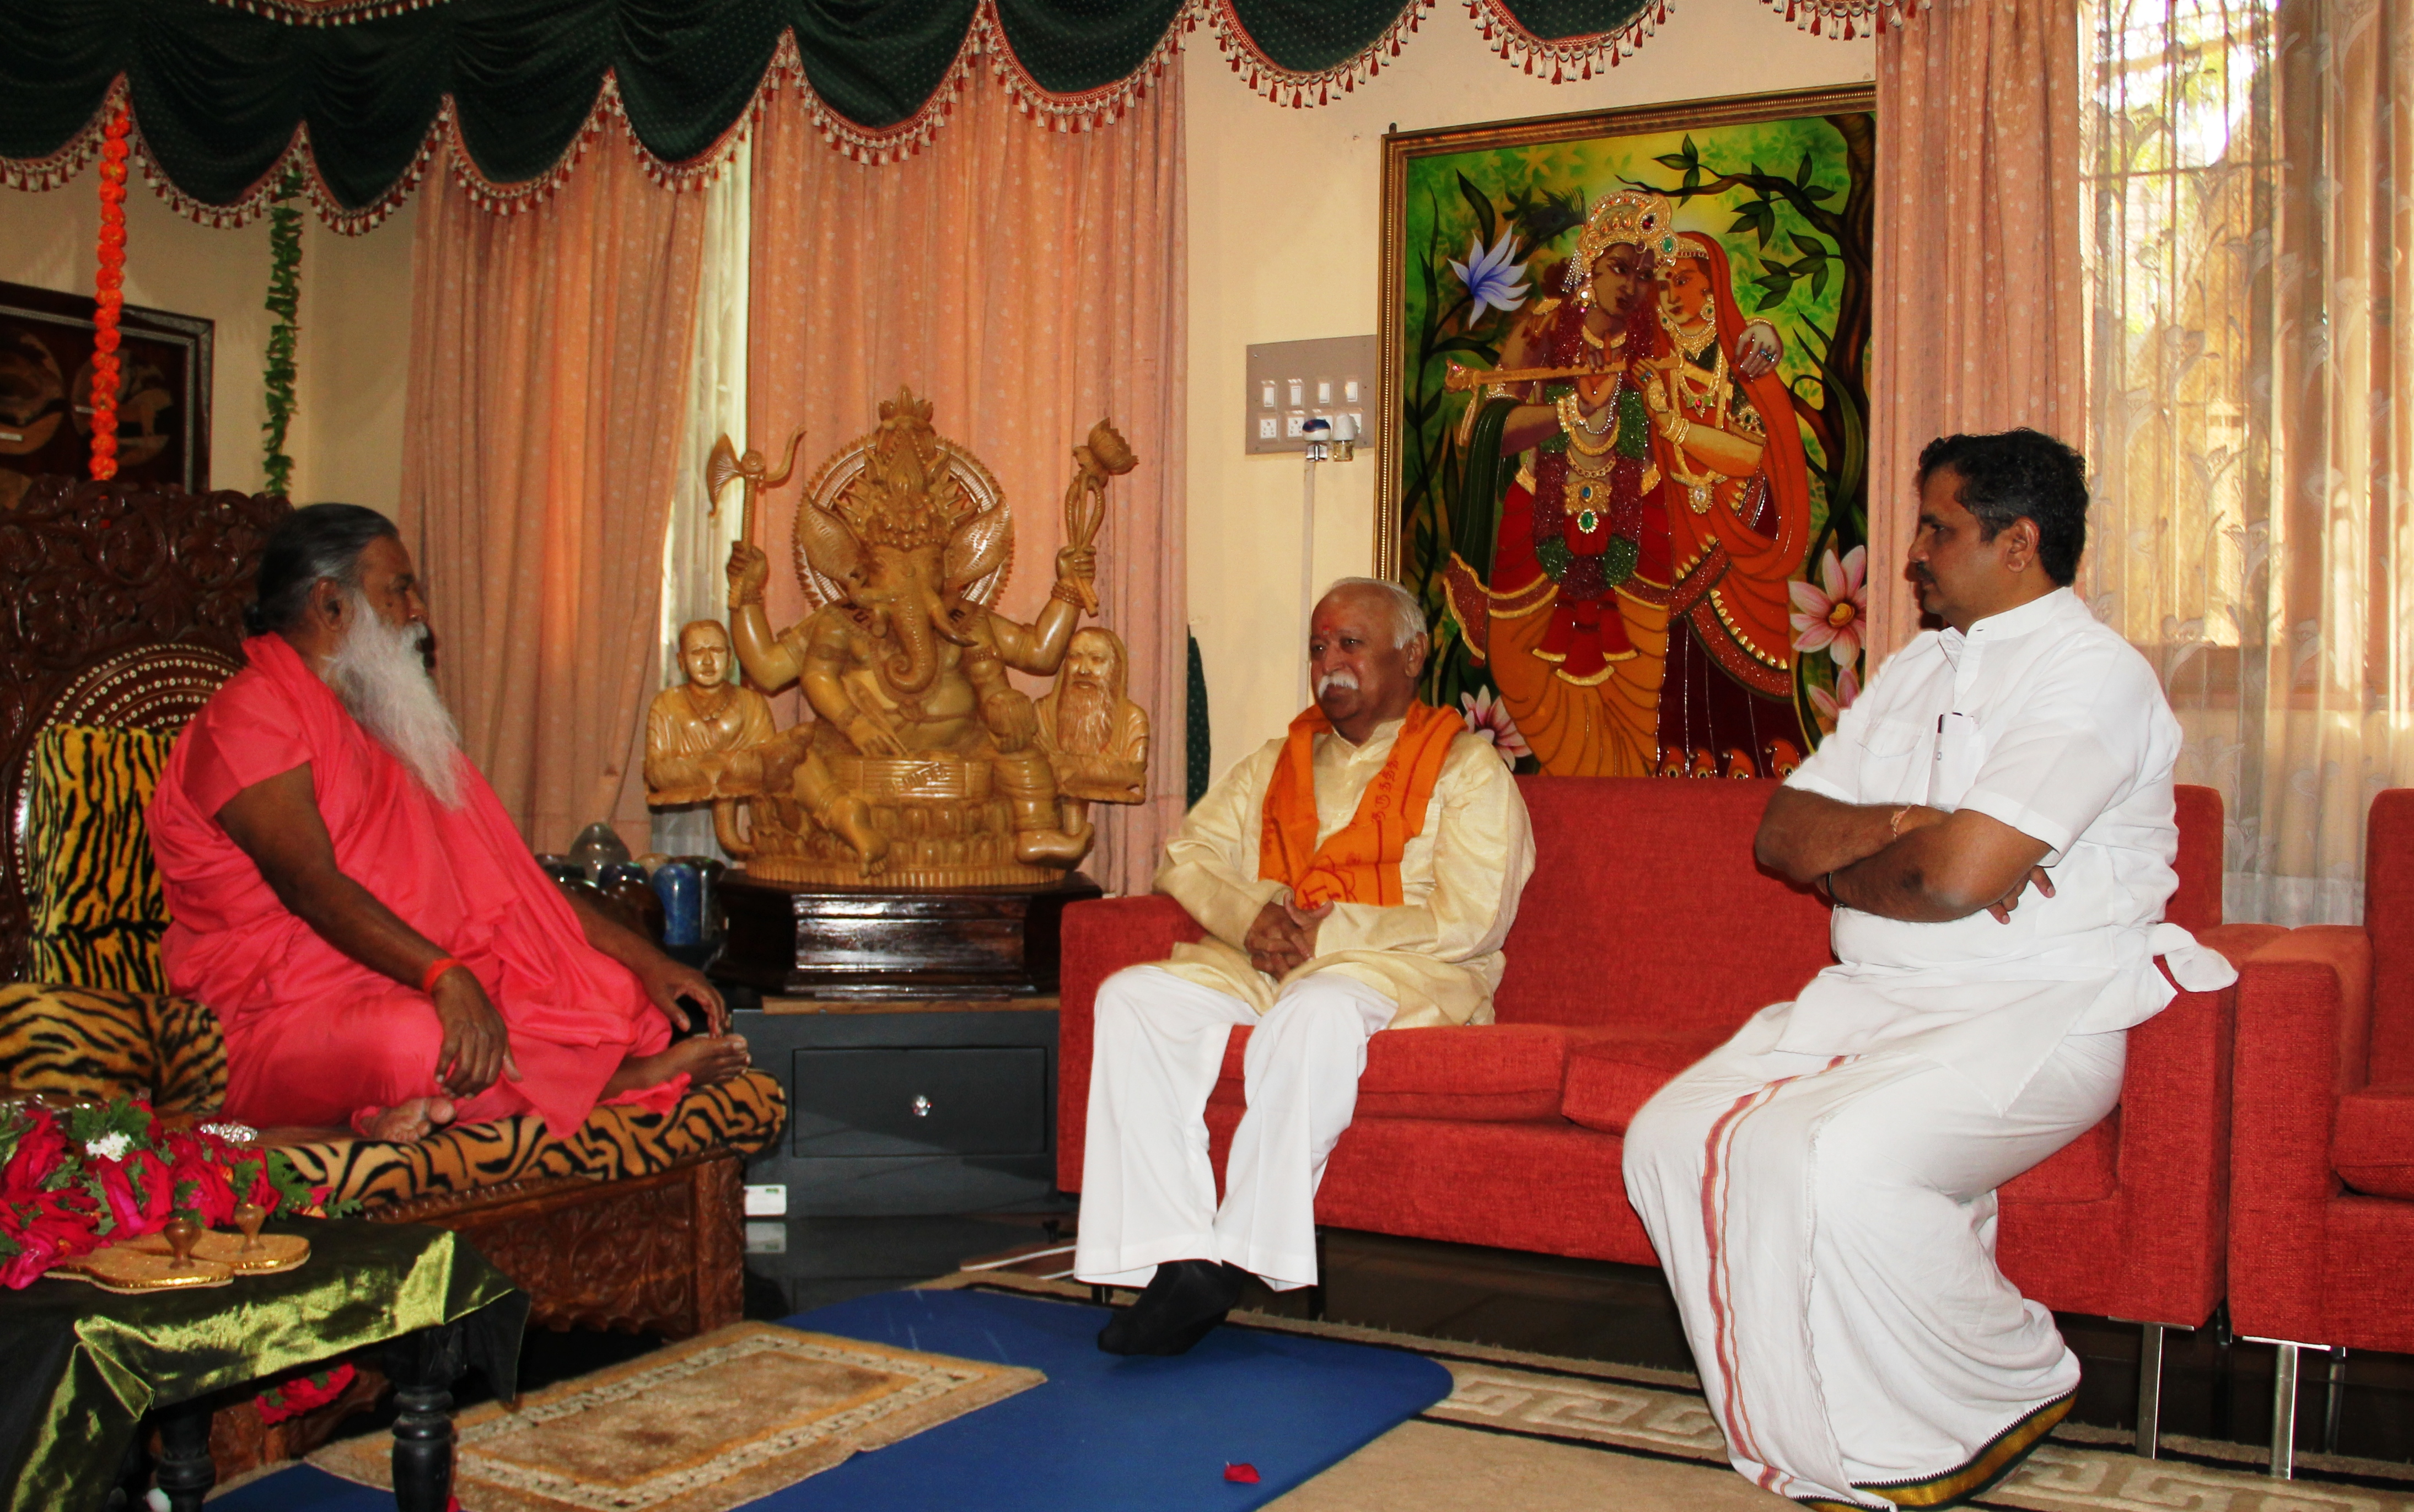 RSS Sarasanghachalak Mohanji Bhagwat met Sri Ganapati Sacchidananda Swamiji at his Ashram in Mysuru February 01, 2015